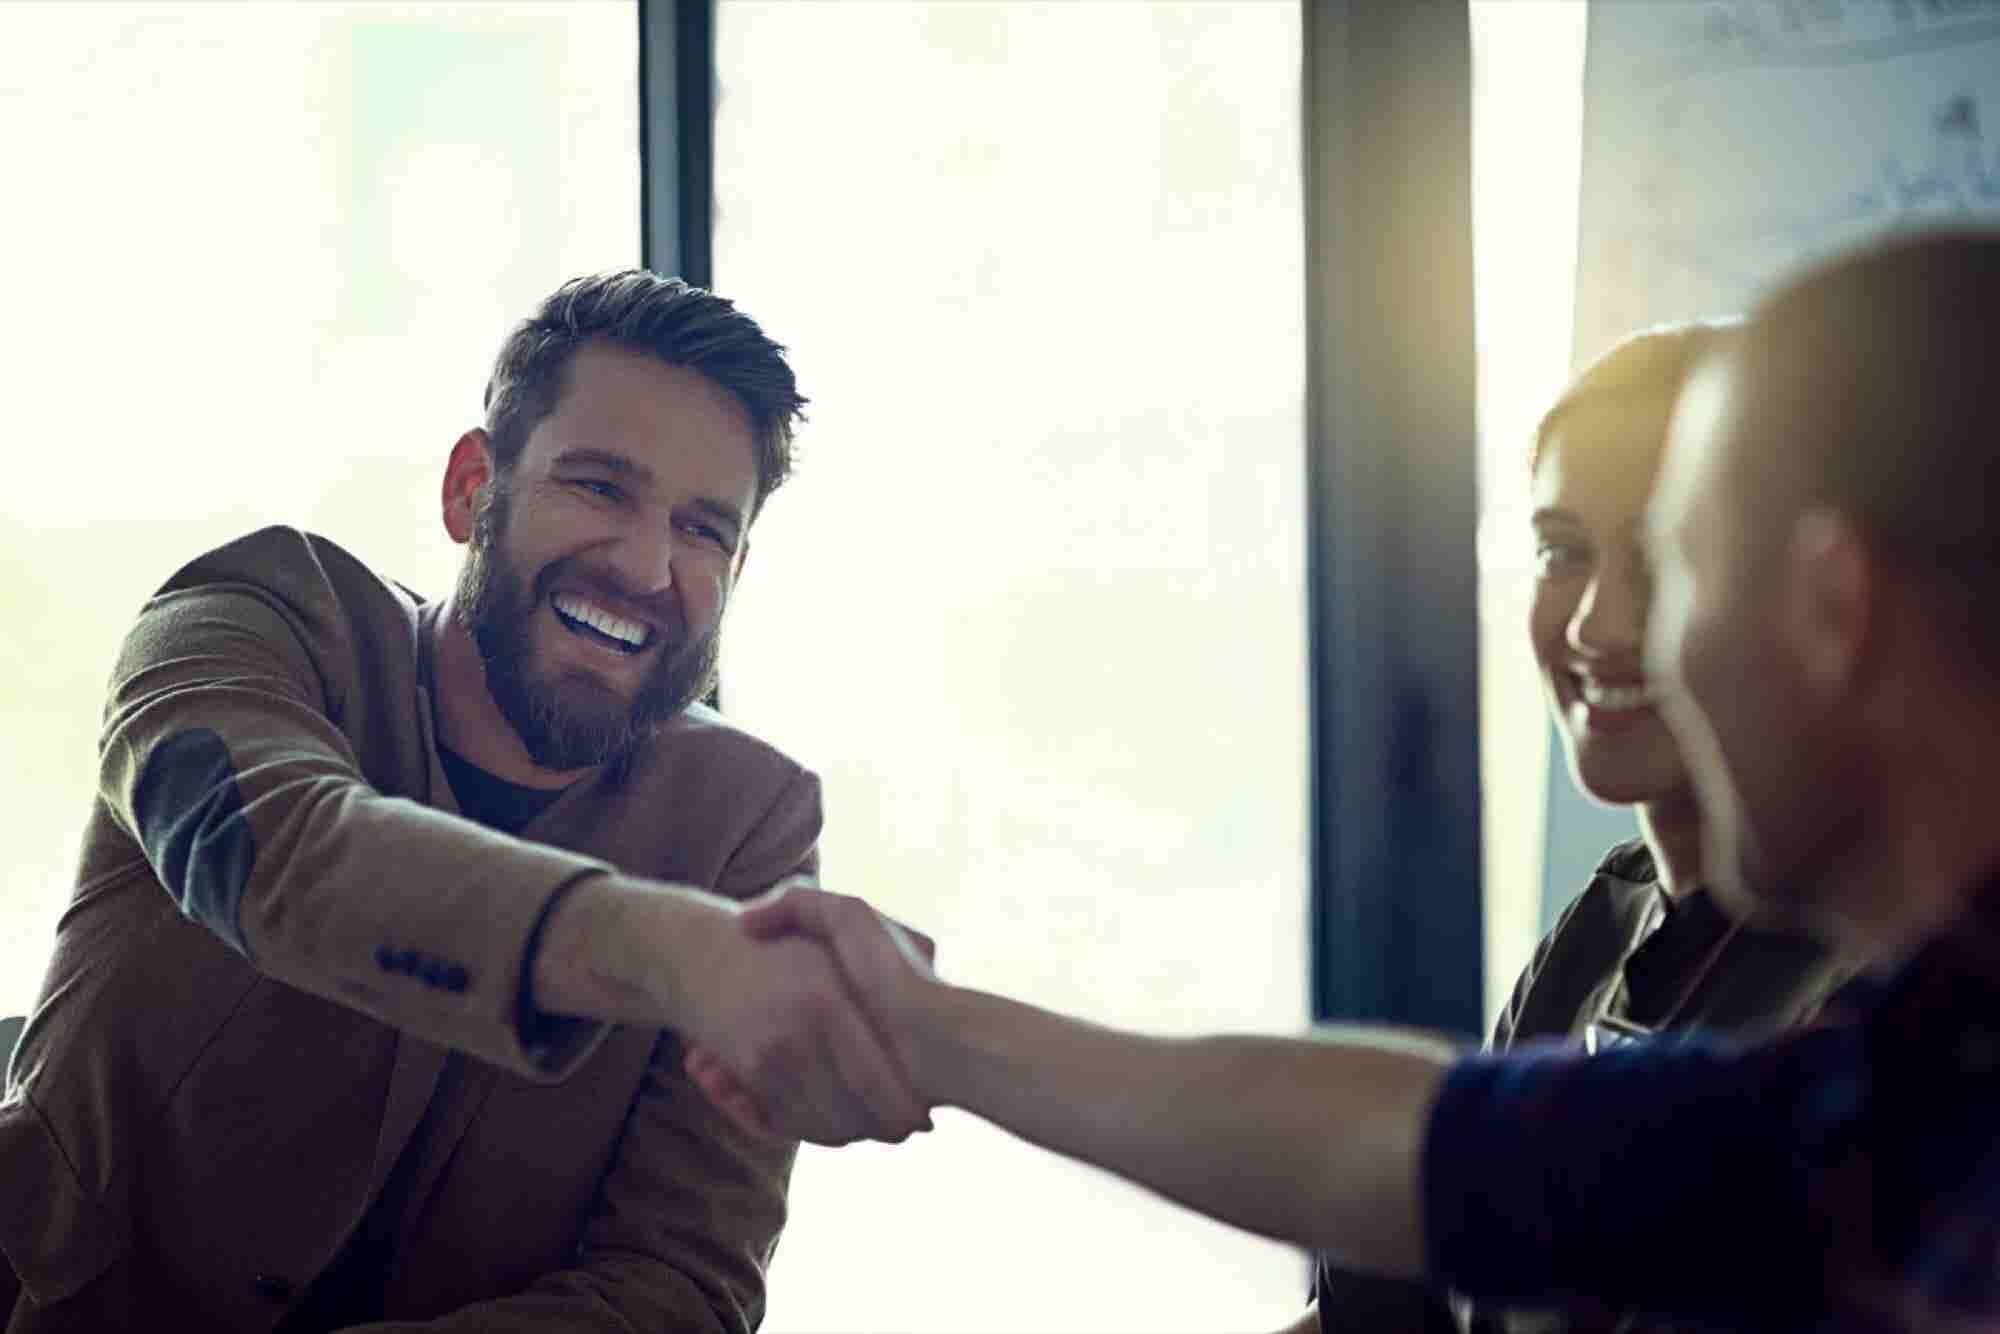 10 Traits of Entrepreneurs Who Built Billion-Dollar Companies